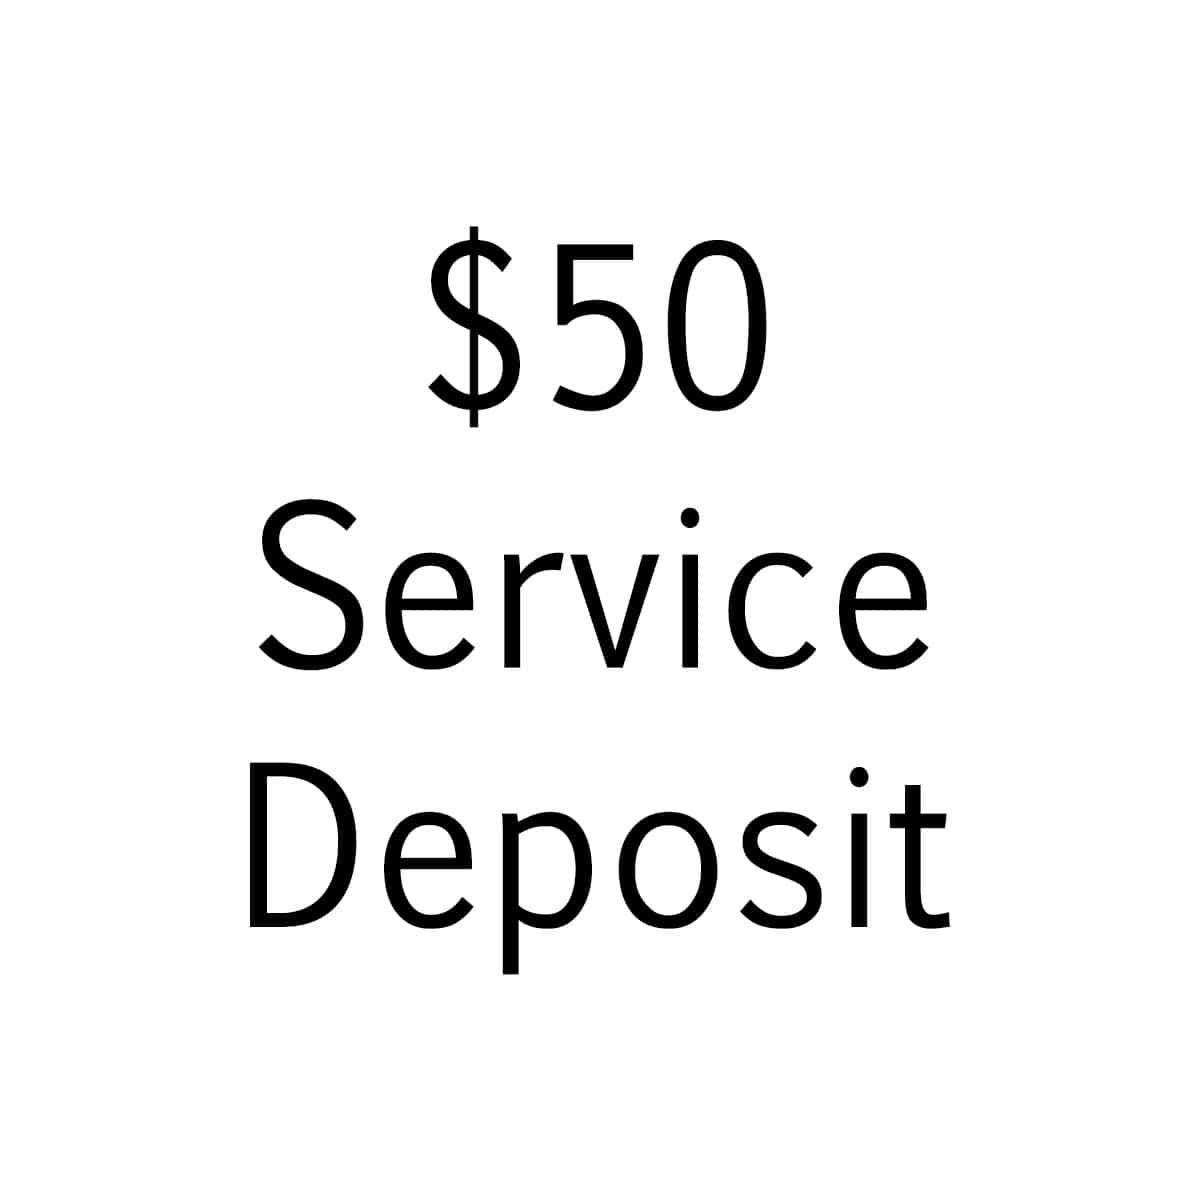 Service deposit $50